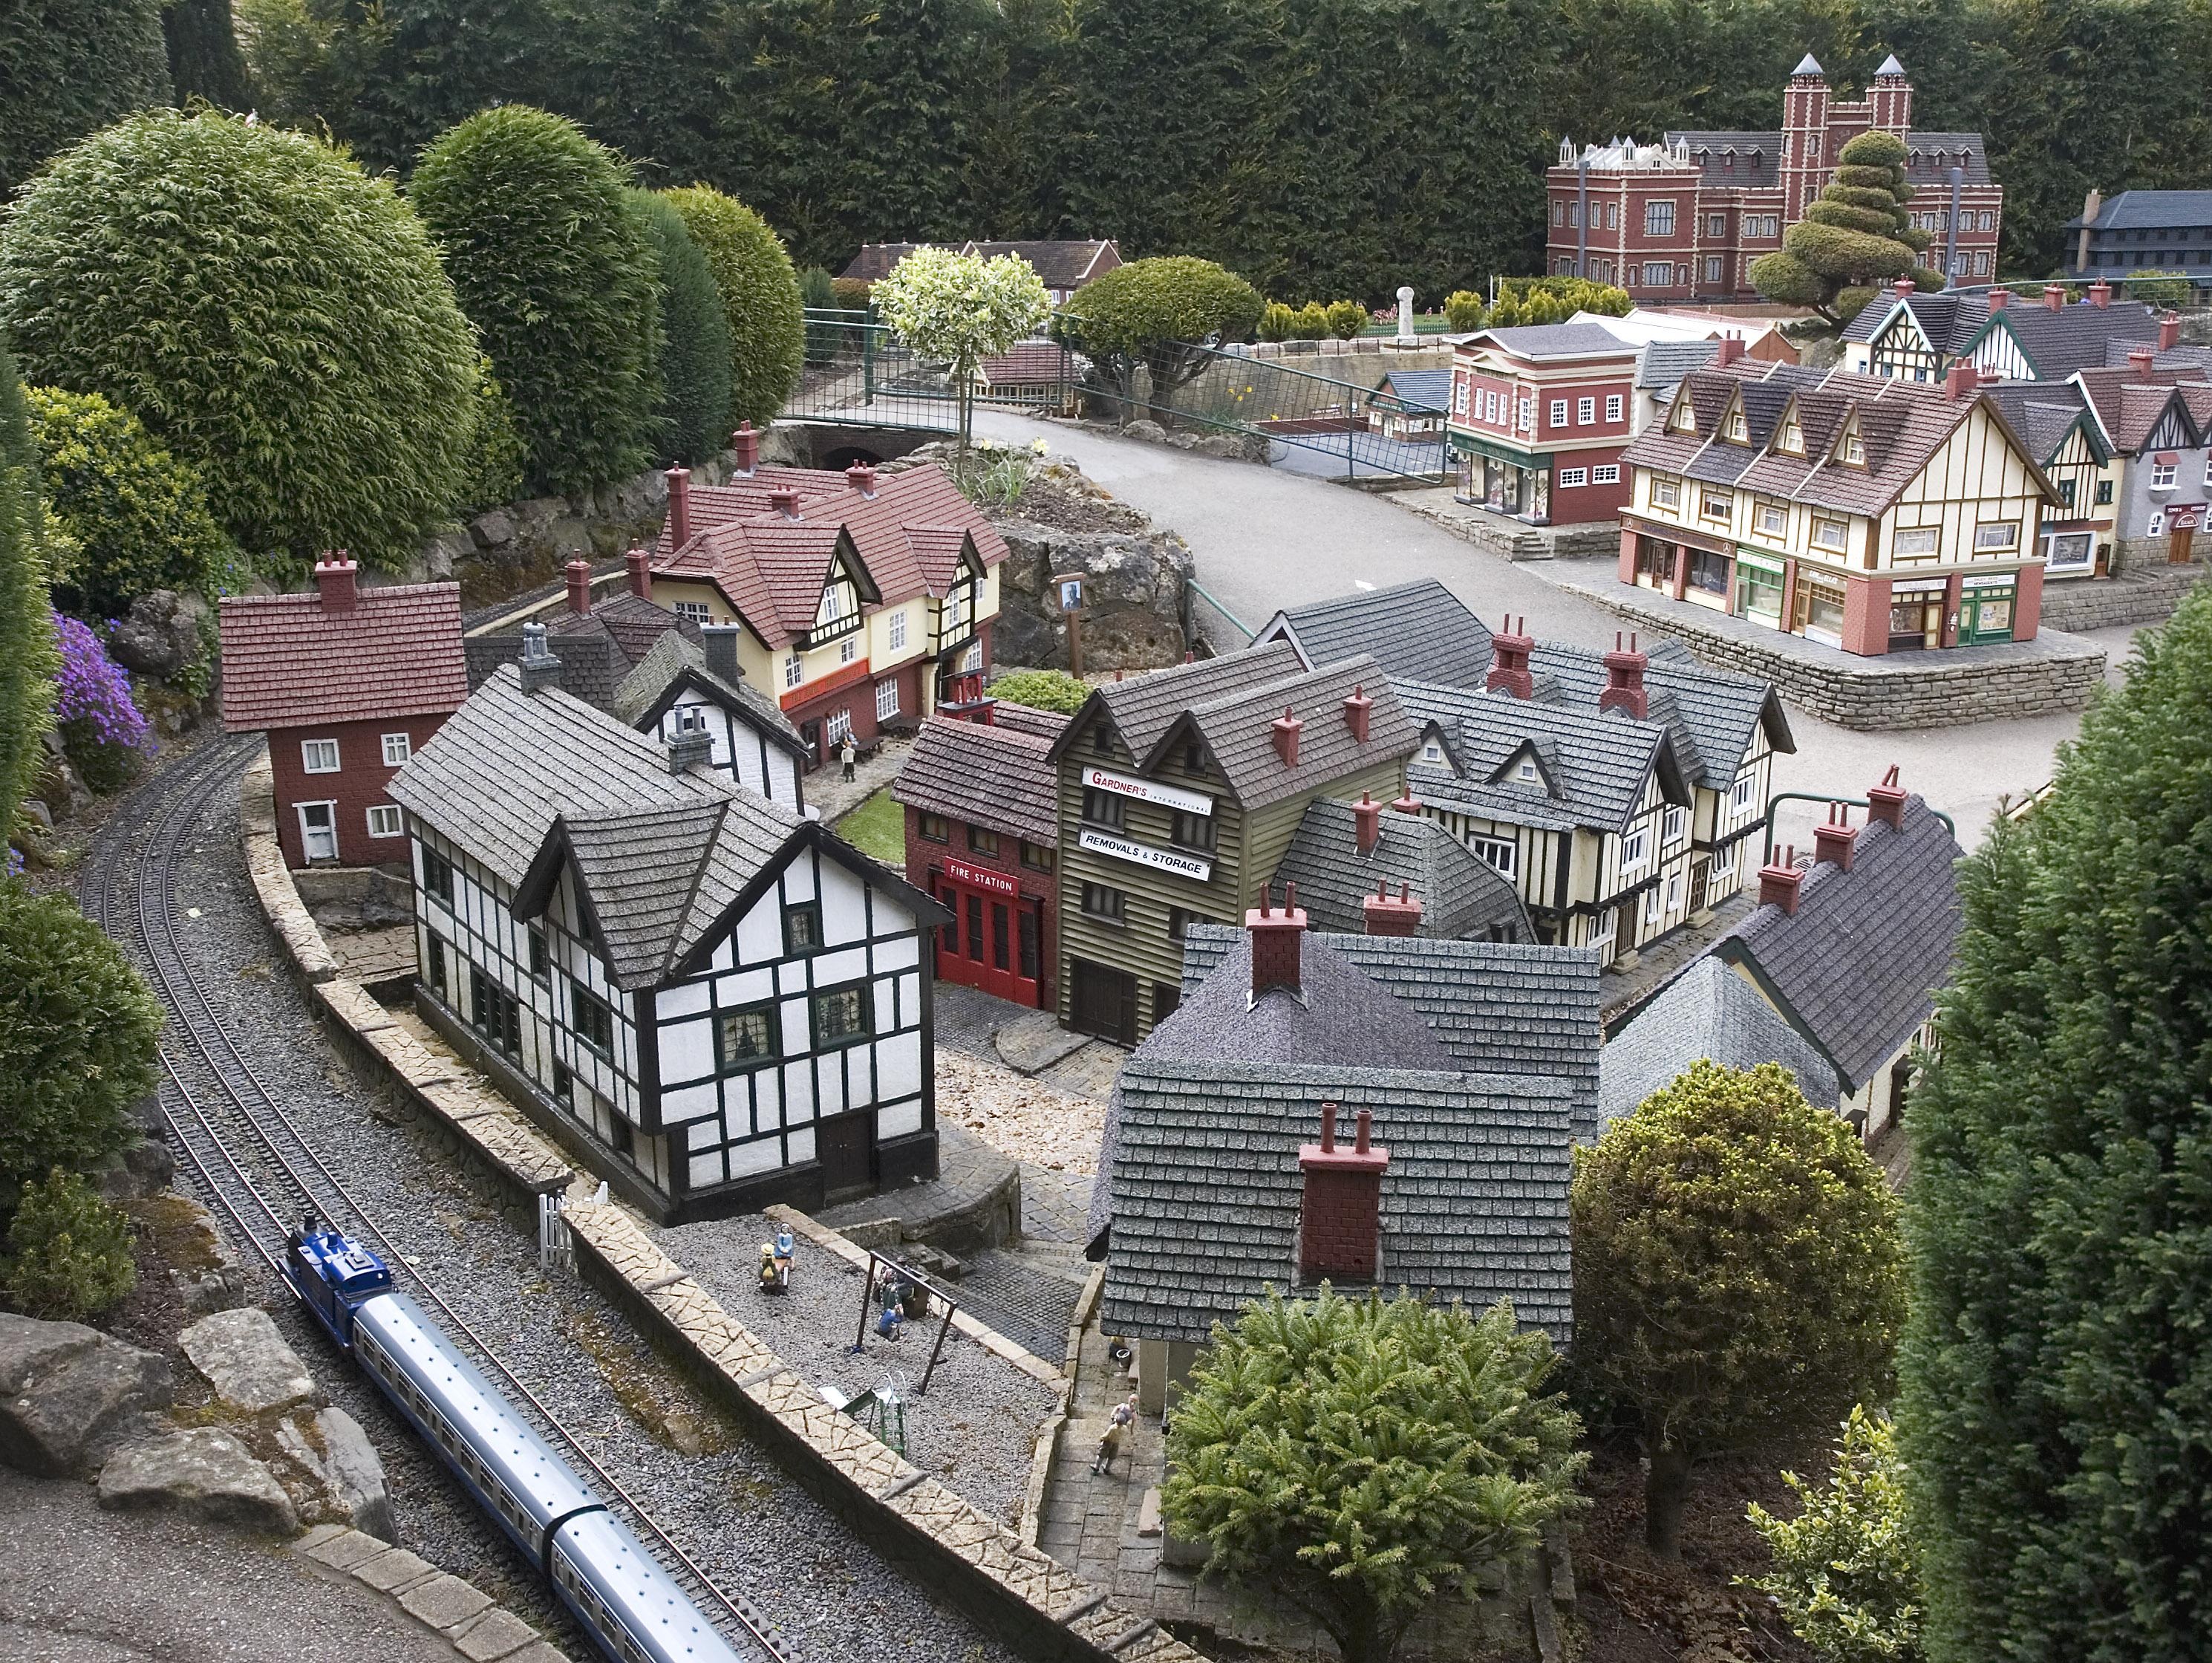 Buildings and train%2C Bekonscot - Gartenbahn